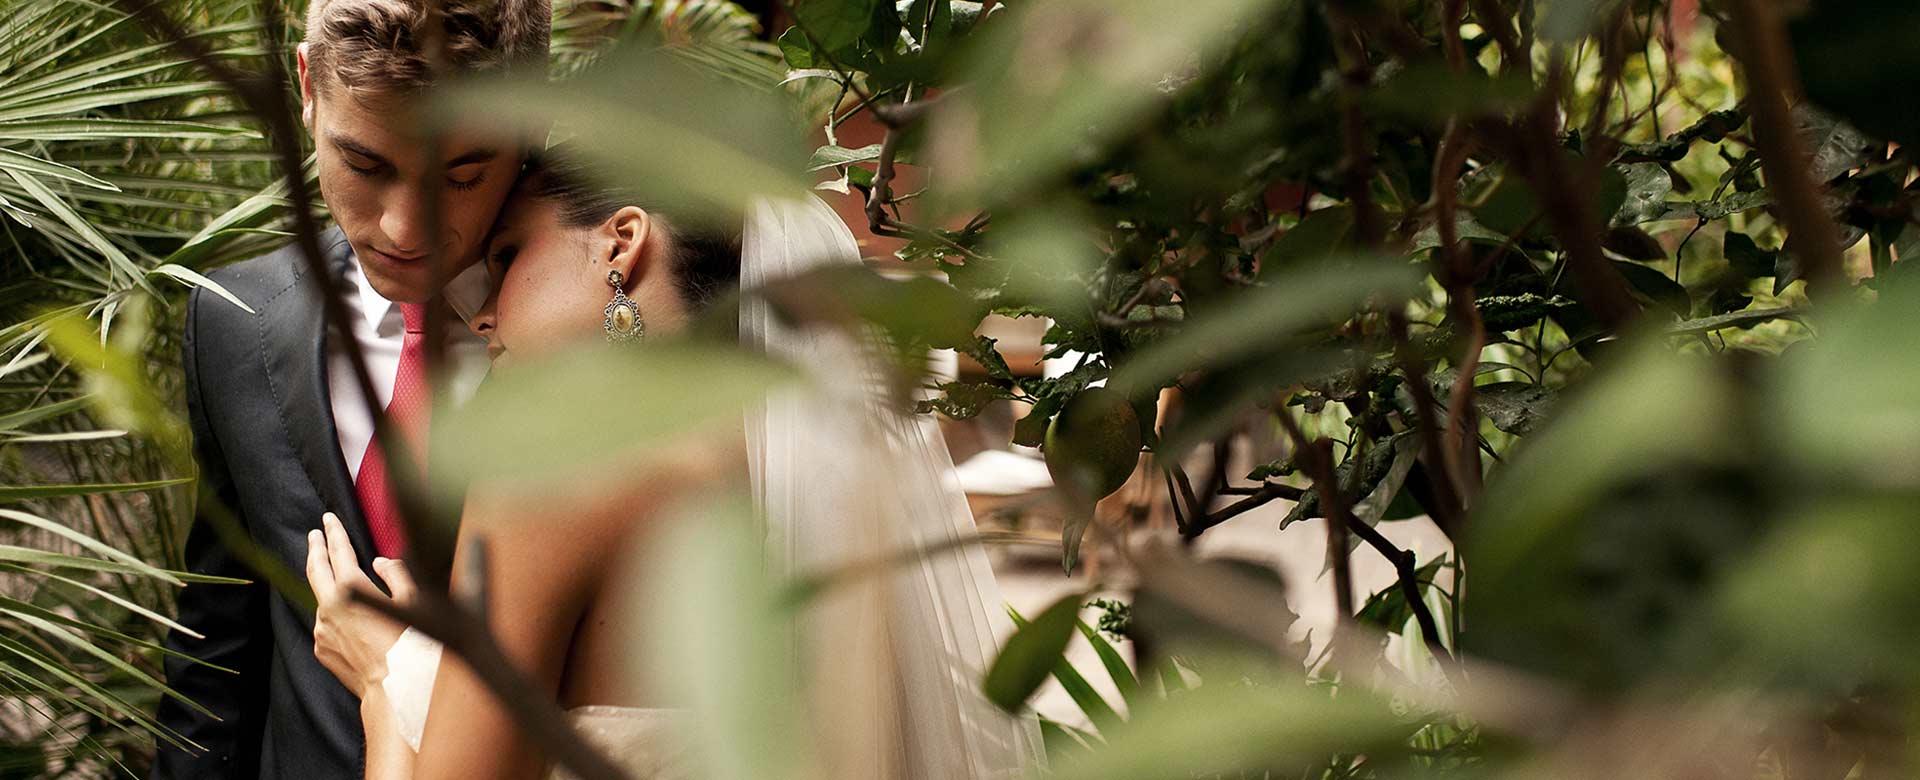 laquintaroja-bodas-02